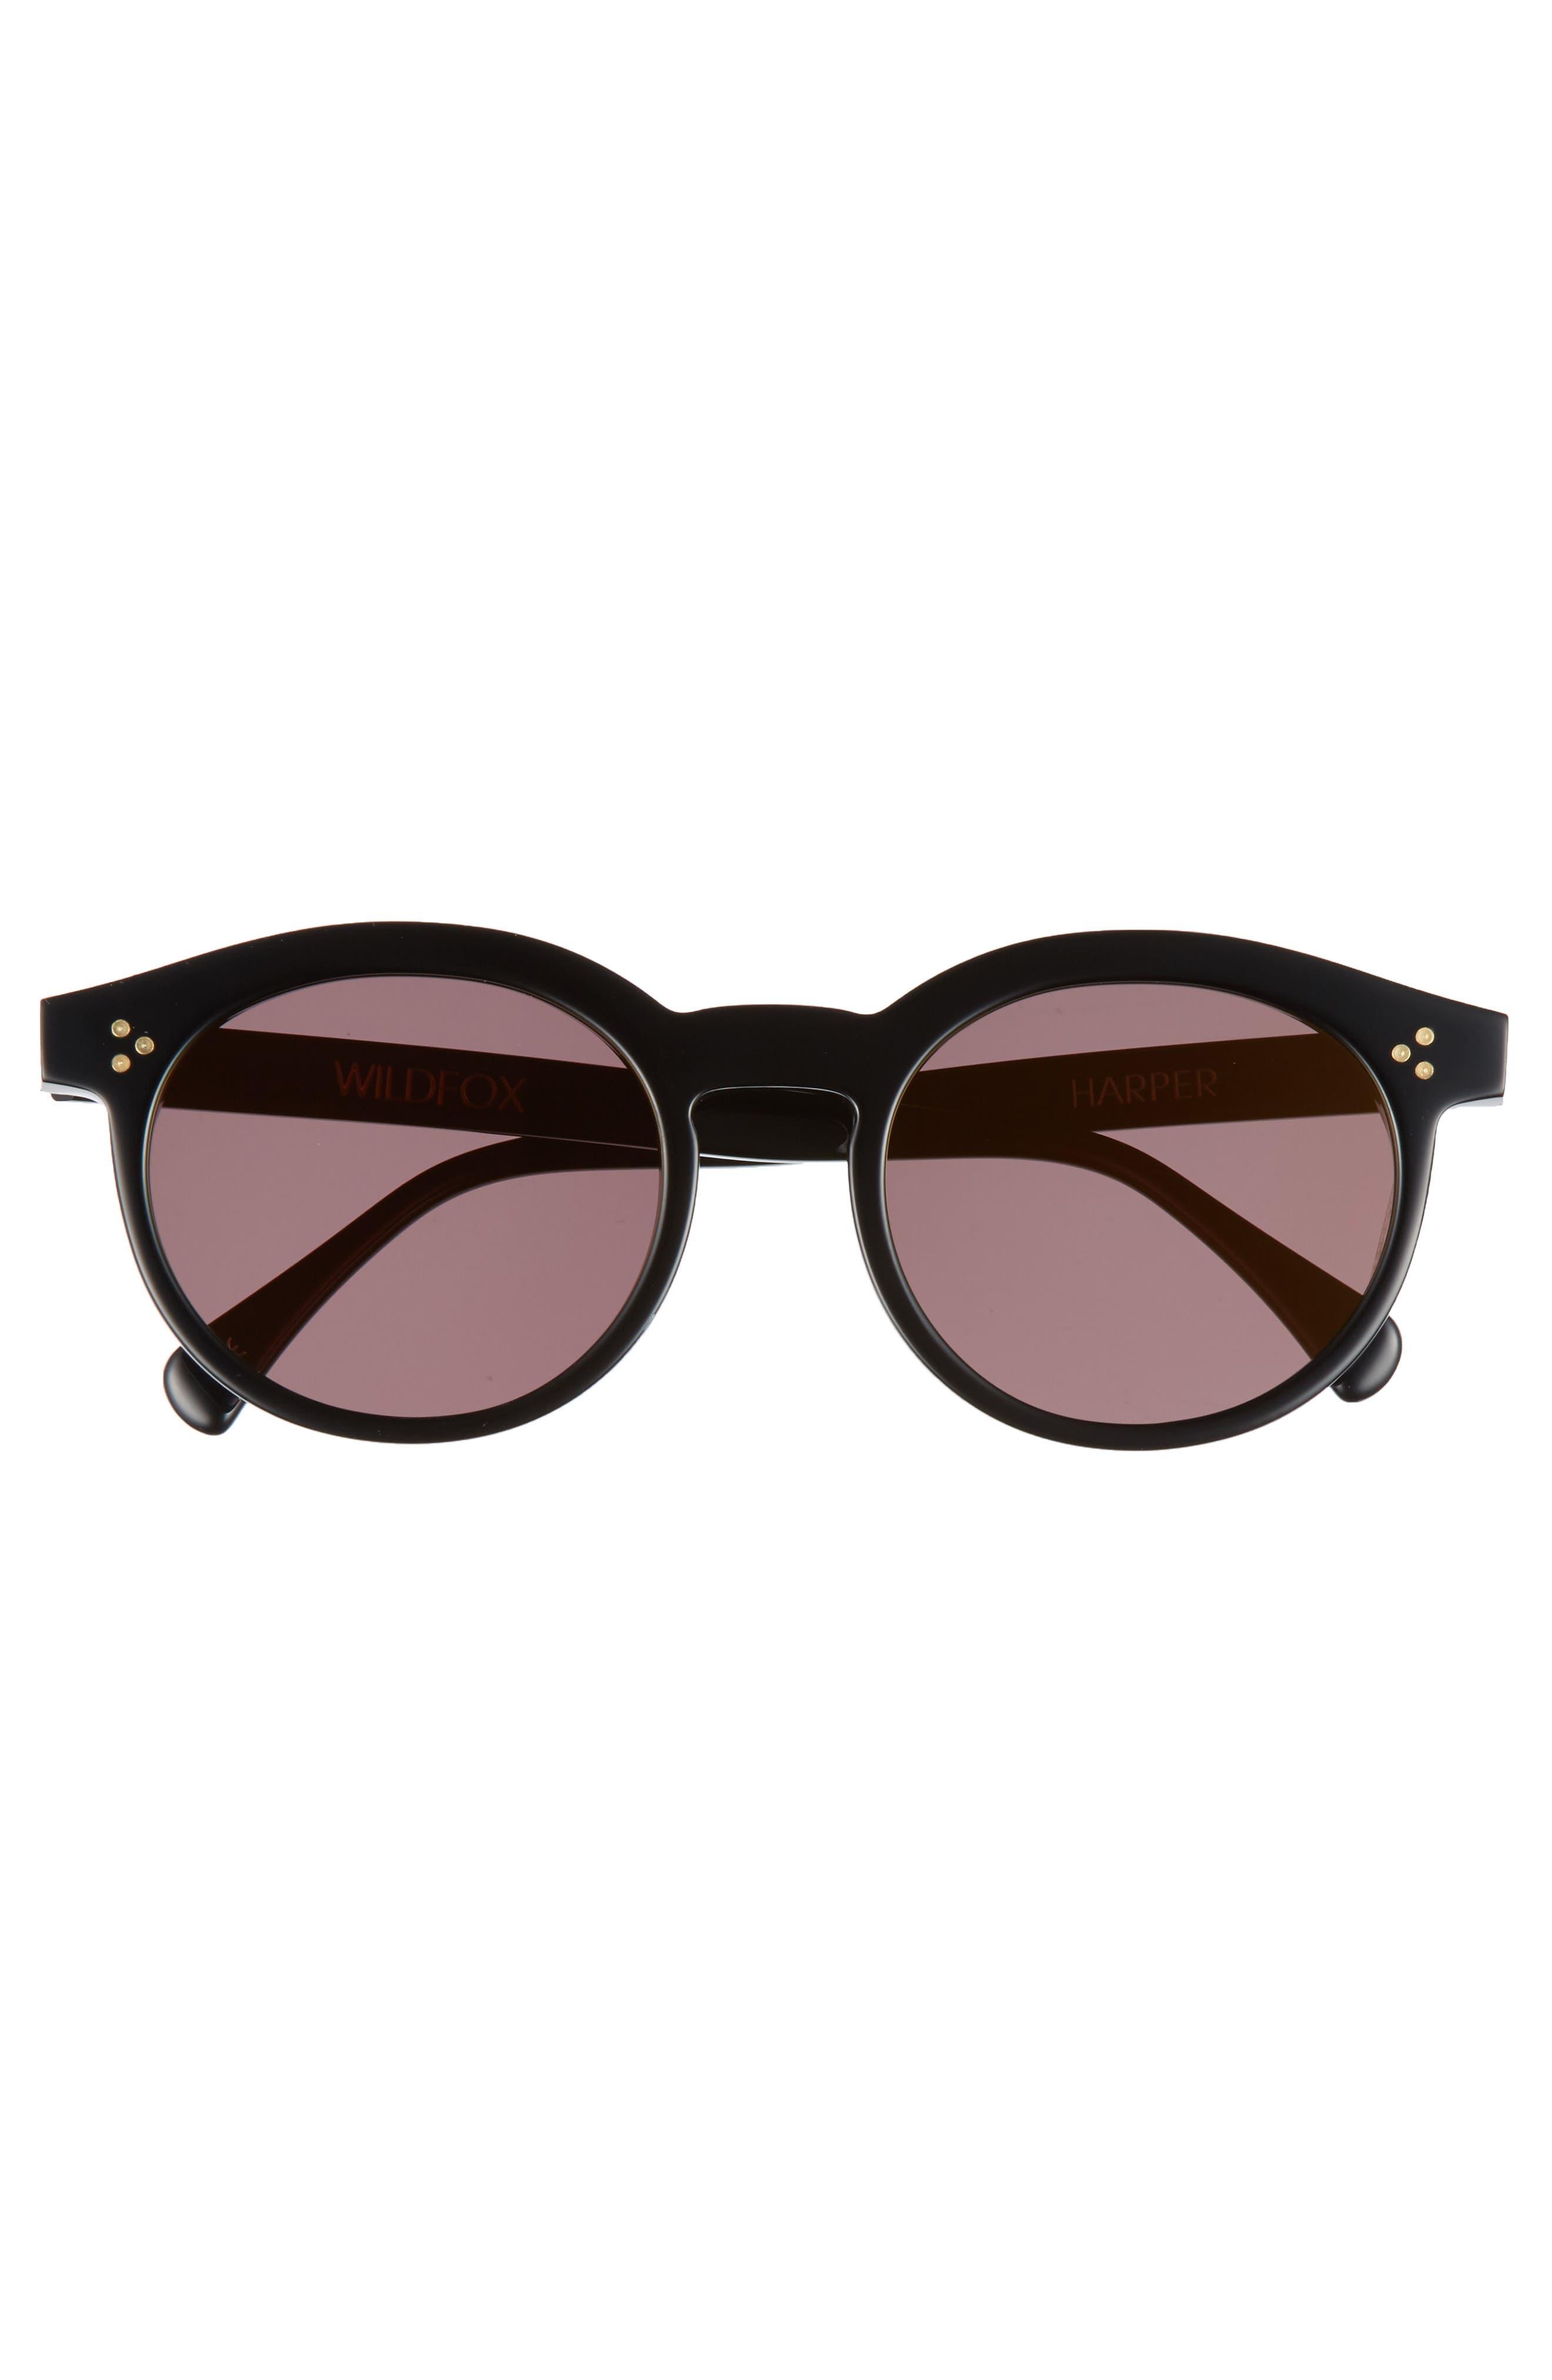 Harper Zero 53mm Round Keyhole Sunglasses,                             Alternate thumbnail 3, color,                             Black/ Gold